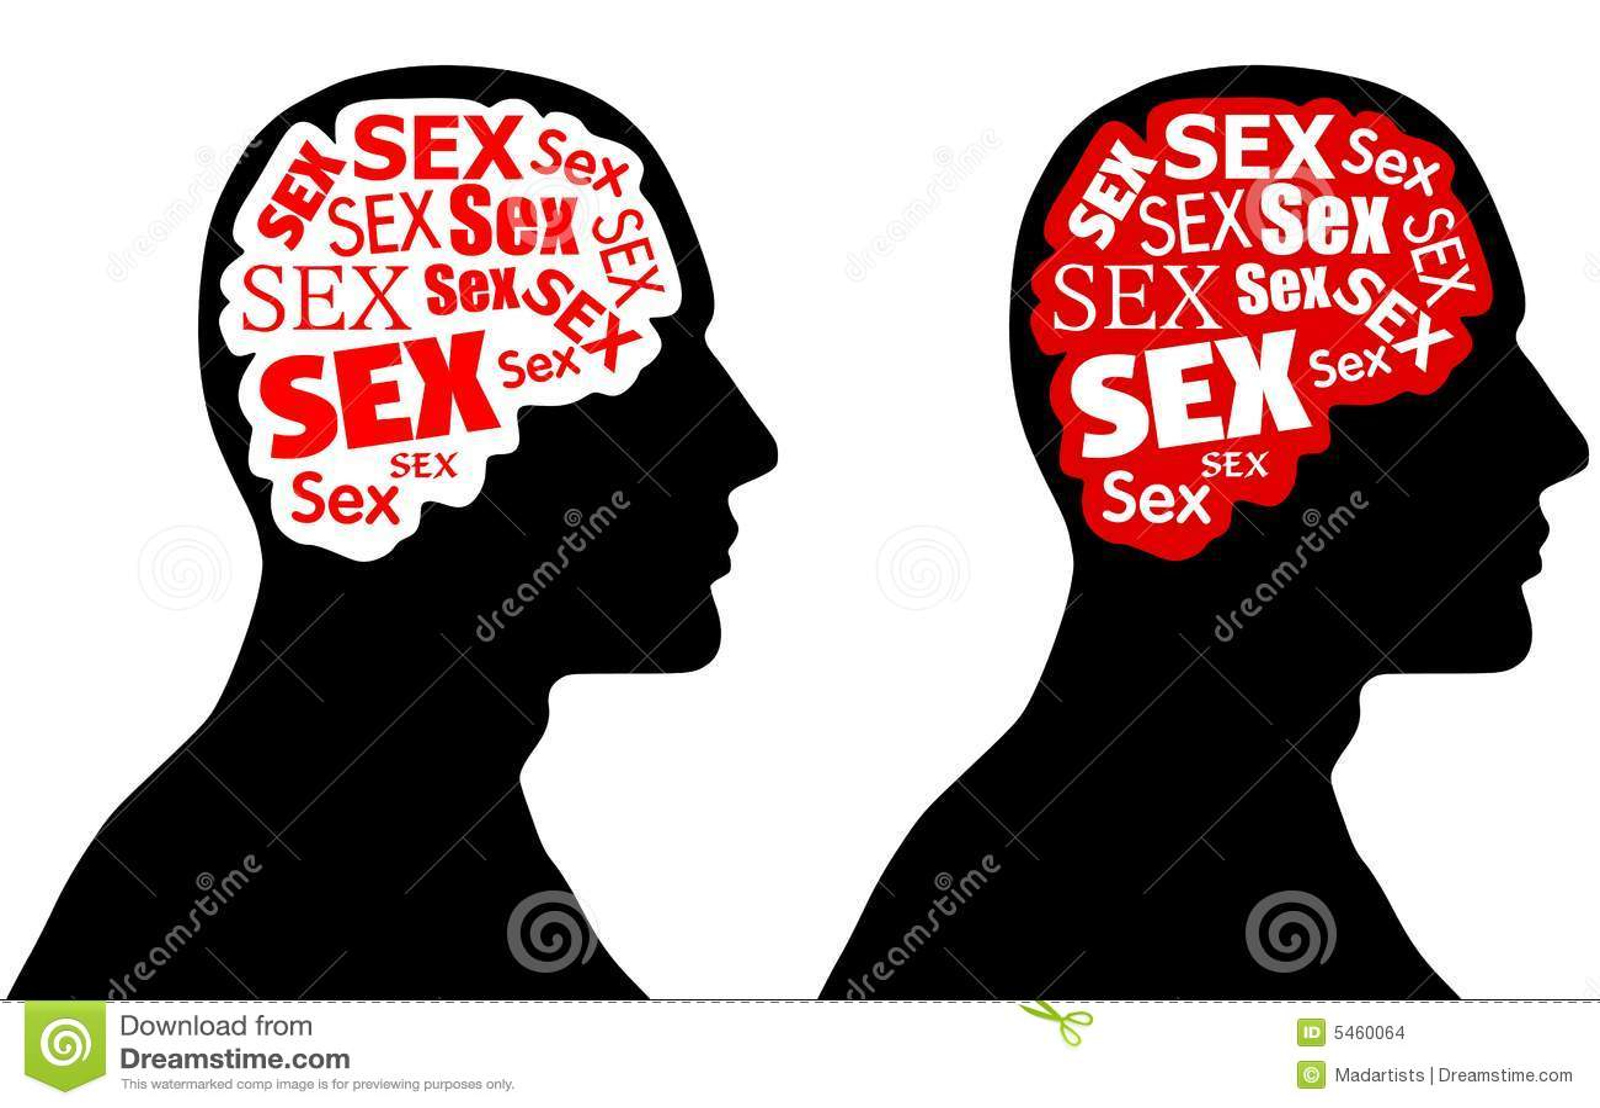 Секс зависимость вики